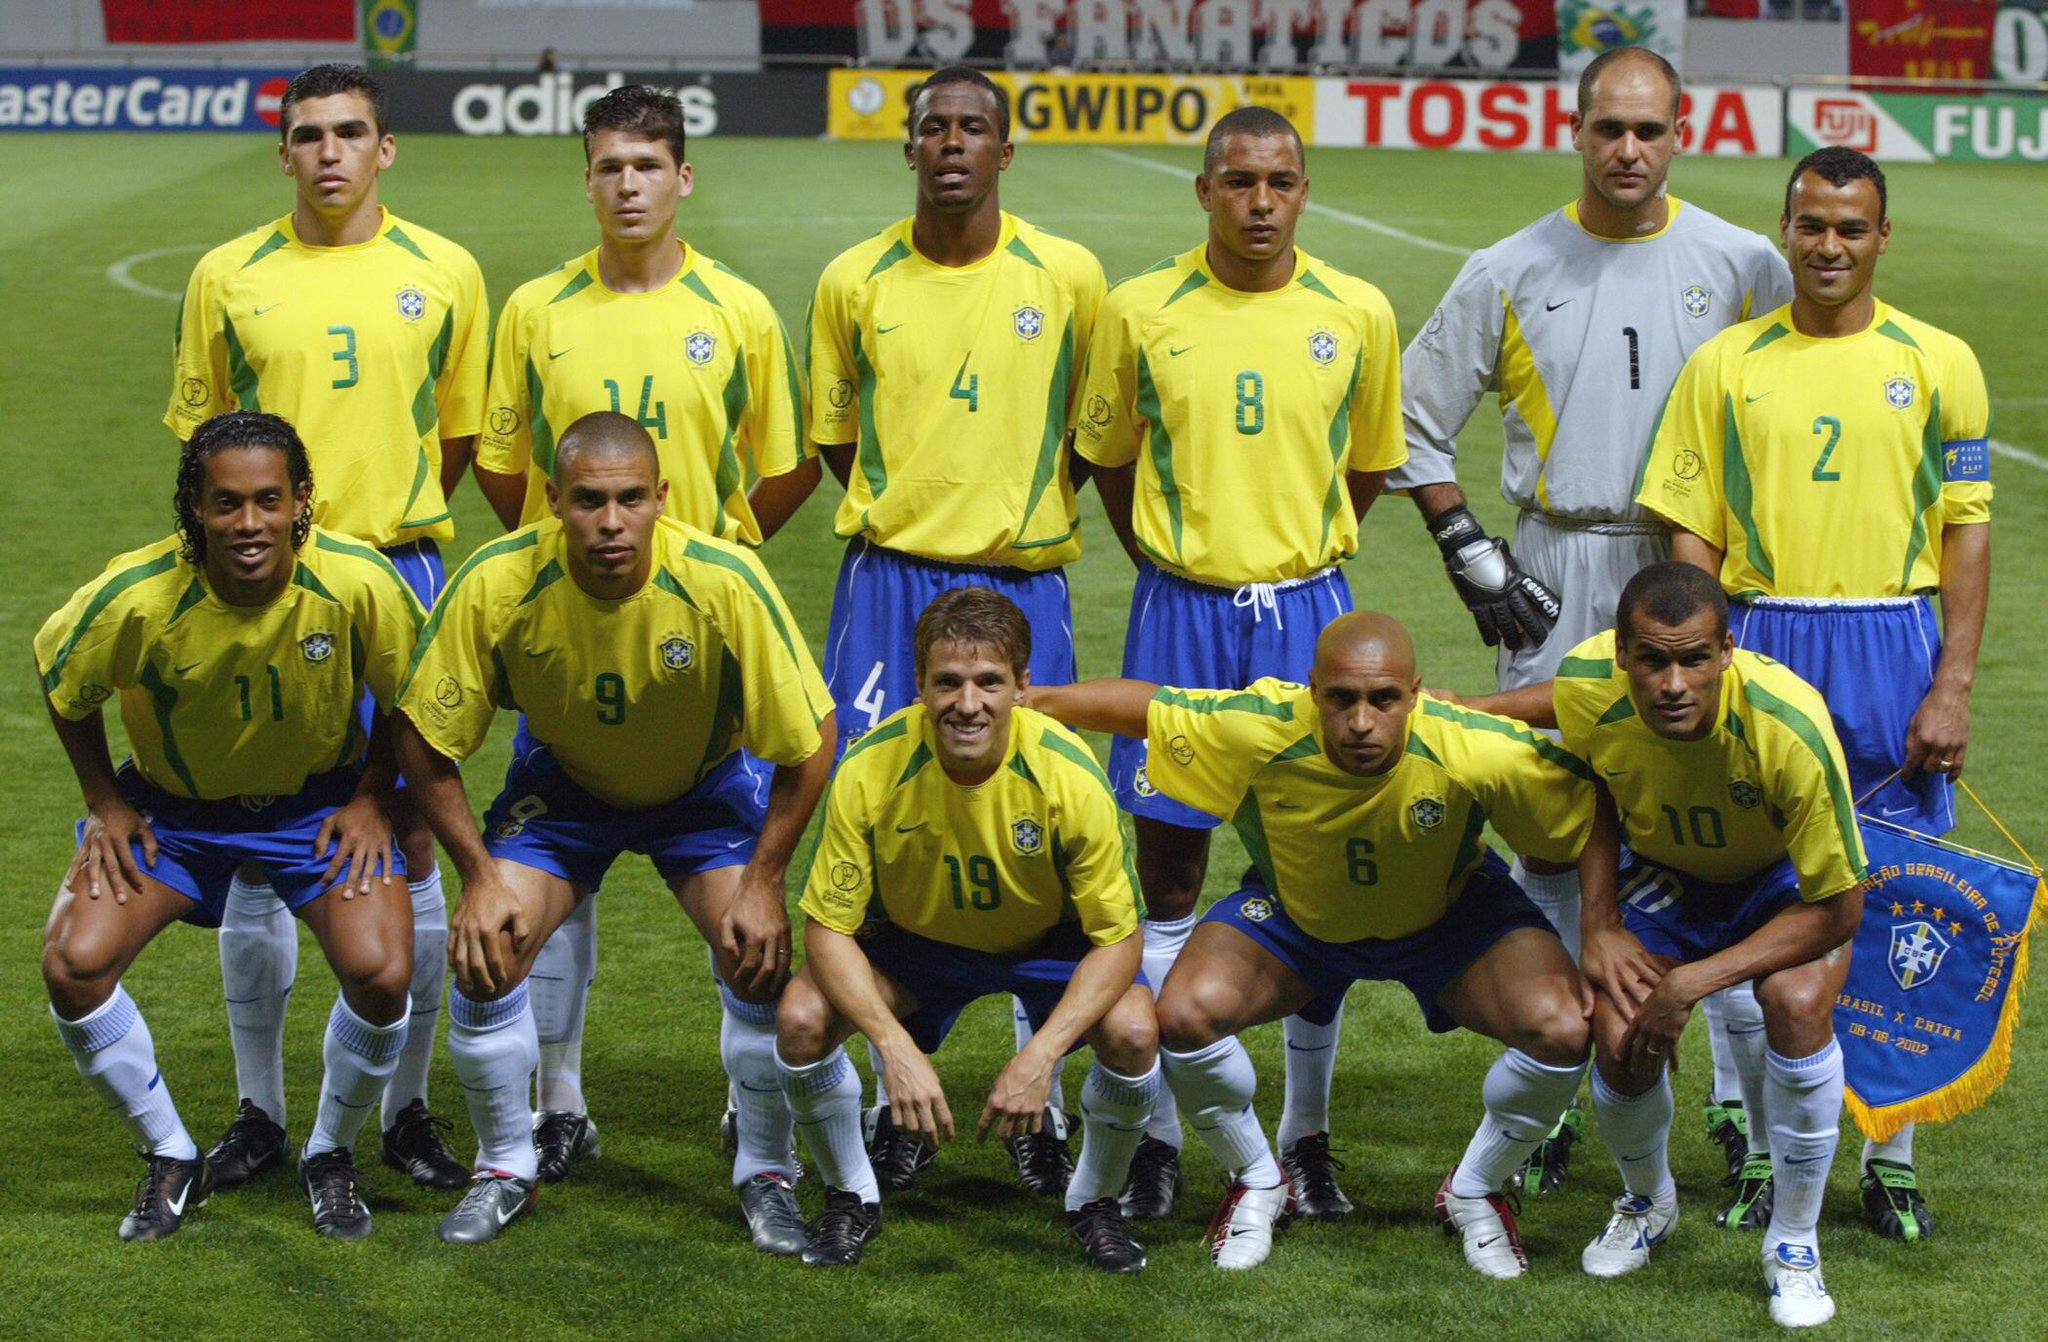 Ronaldo, Ronaldinho, Rivaldo, Roberto Carlos, Cafu, Gilberto Silva, Lucio … Brazil's 2002 WC team = Legendary! #tbt http://t.co/9BikO2luL2